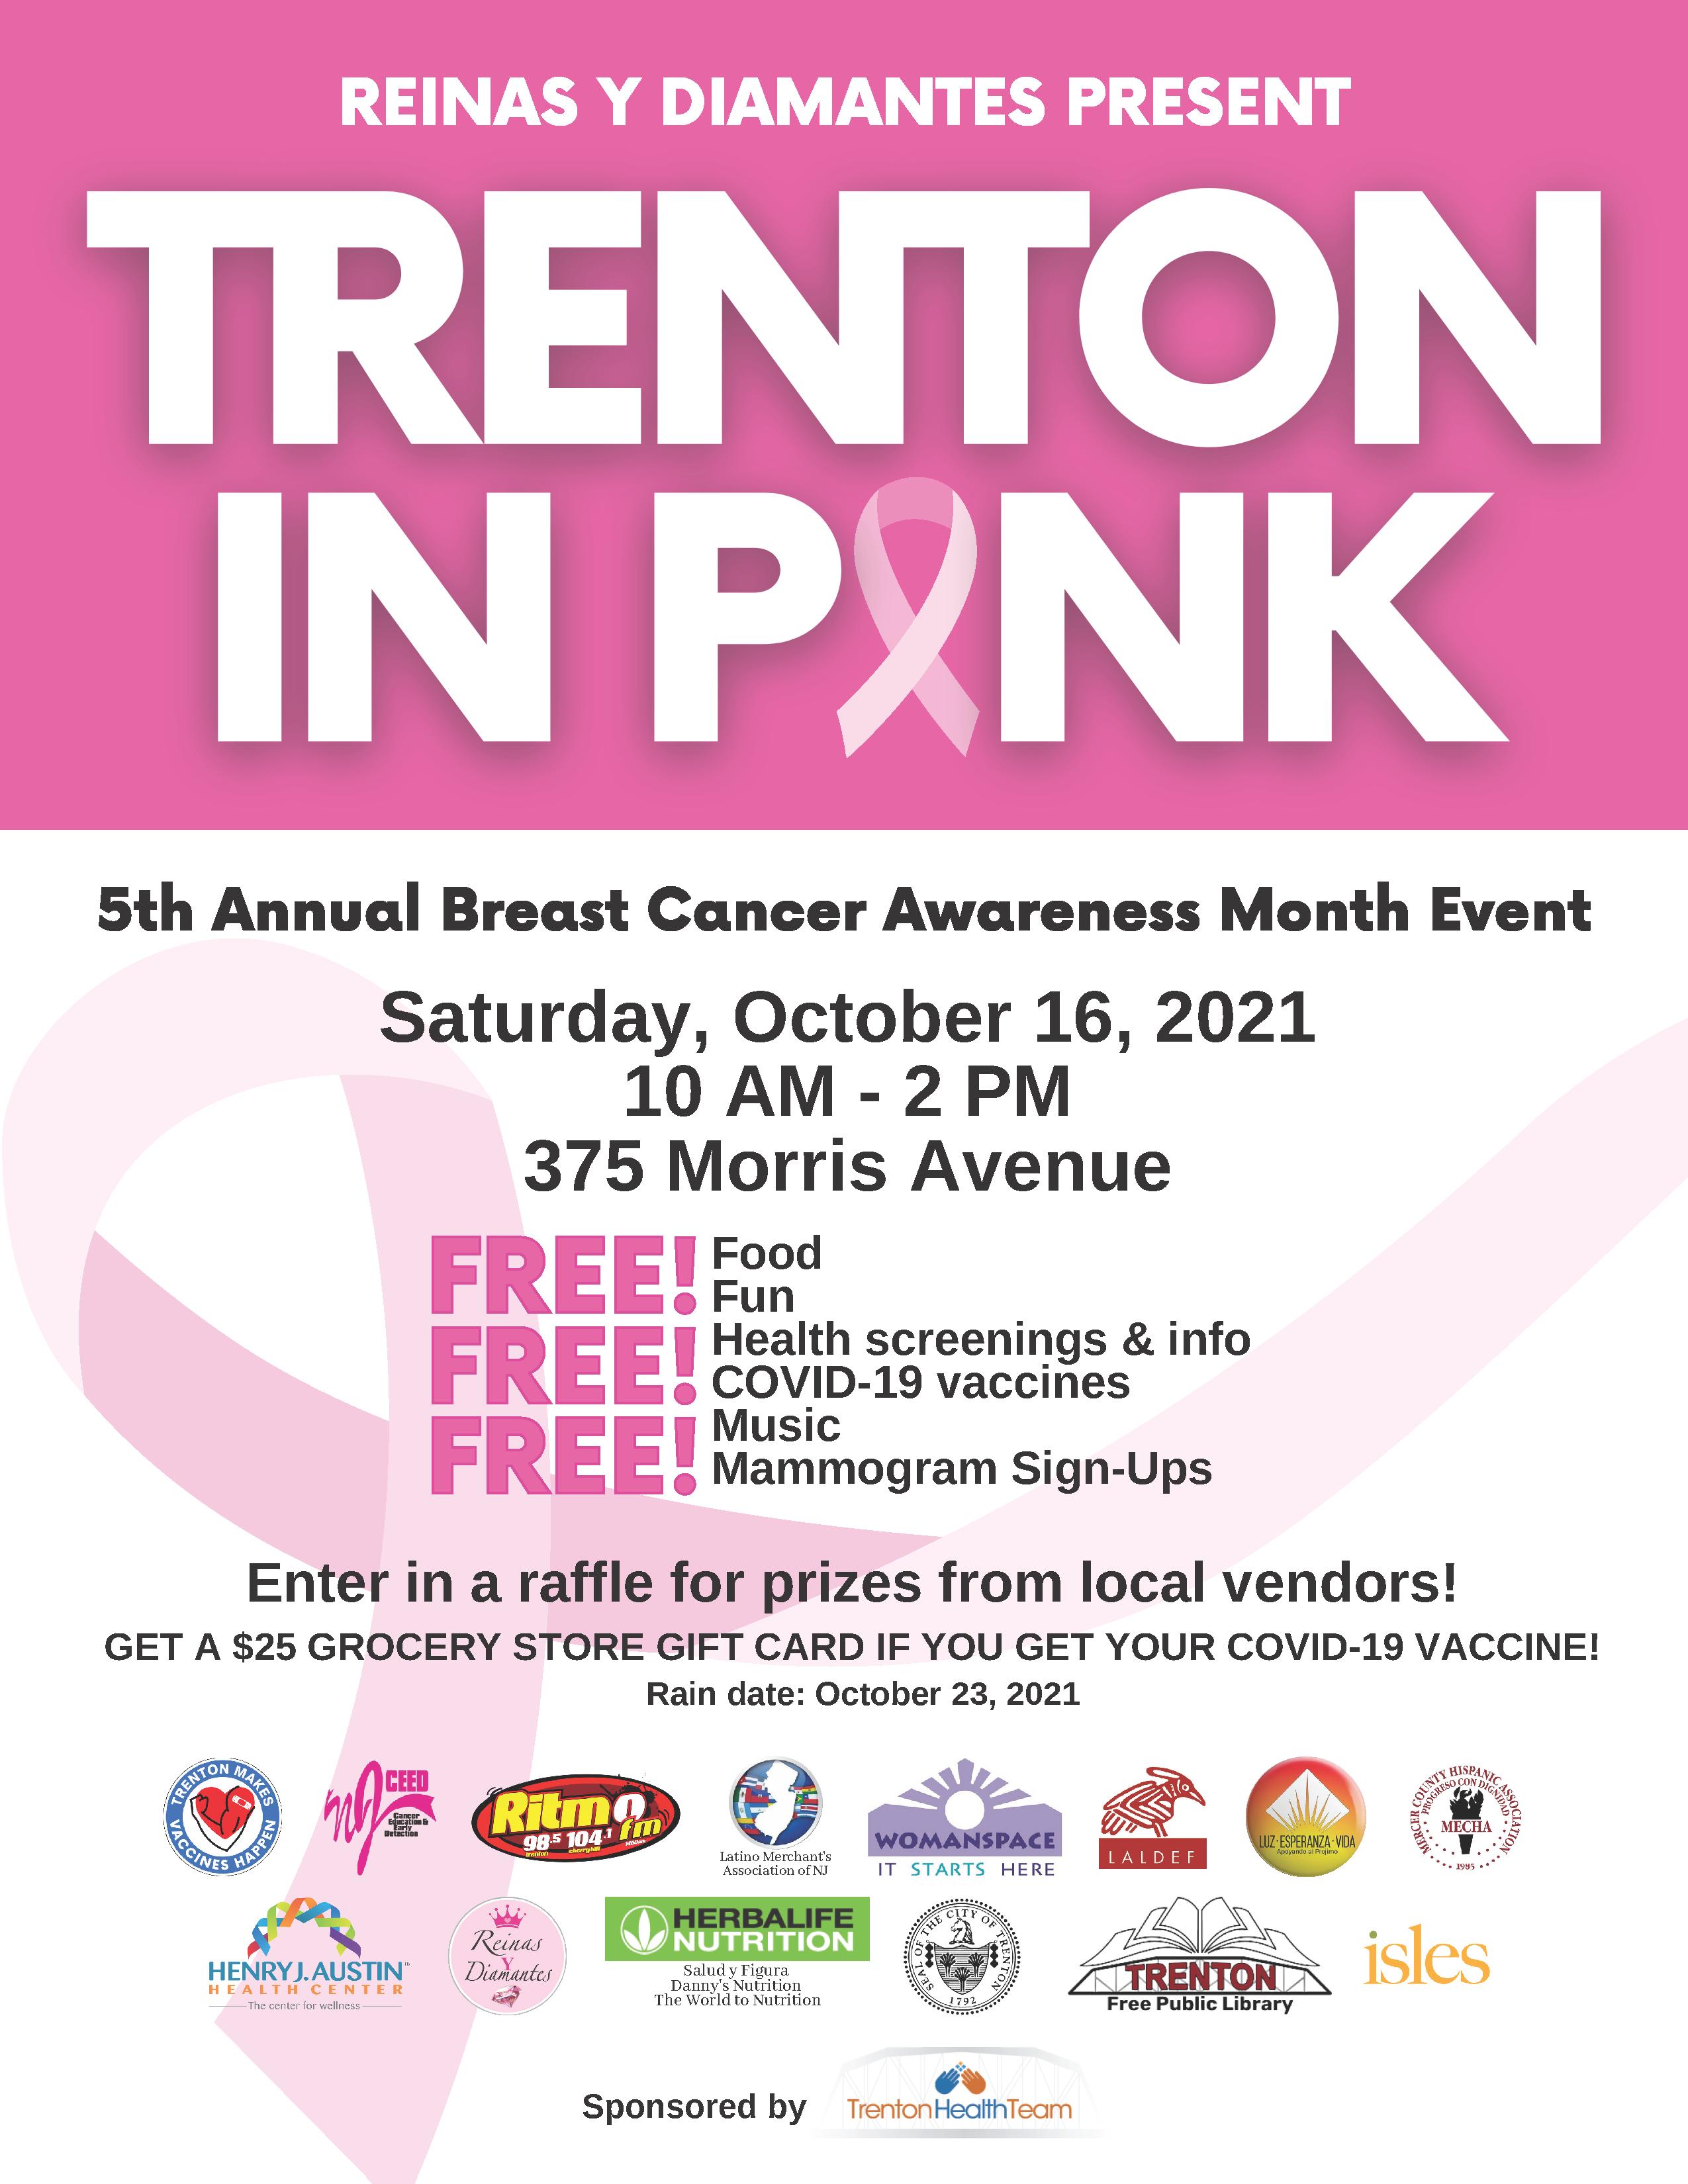 Trenton In Pink